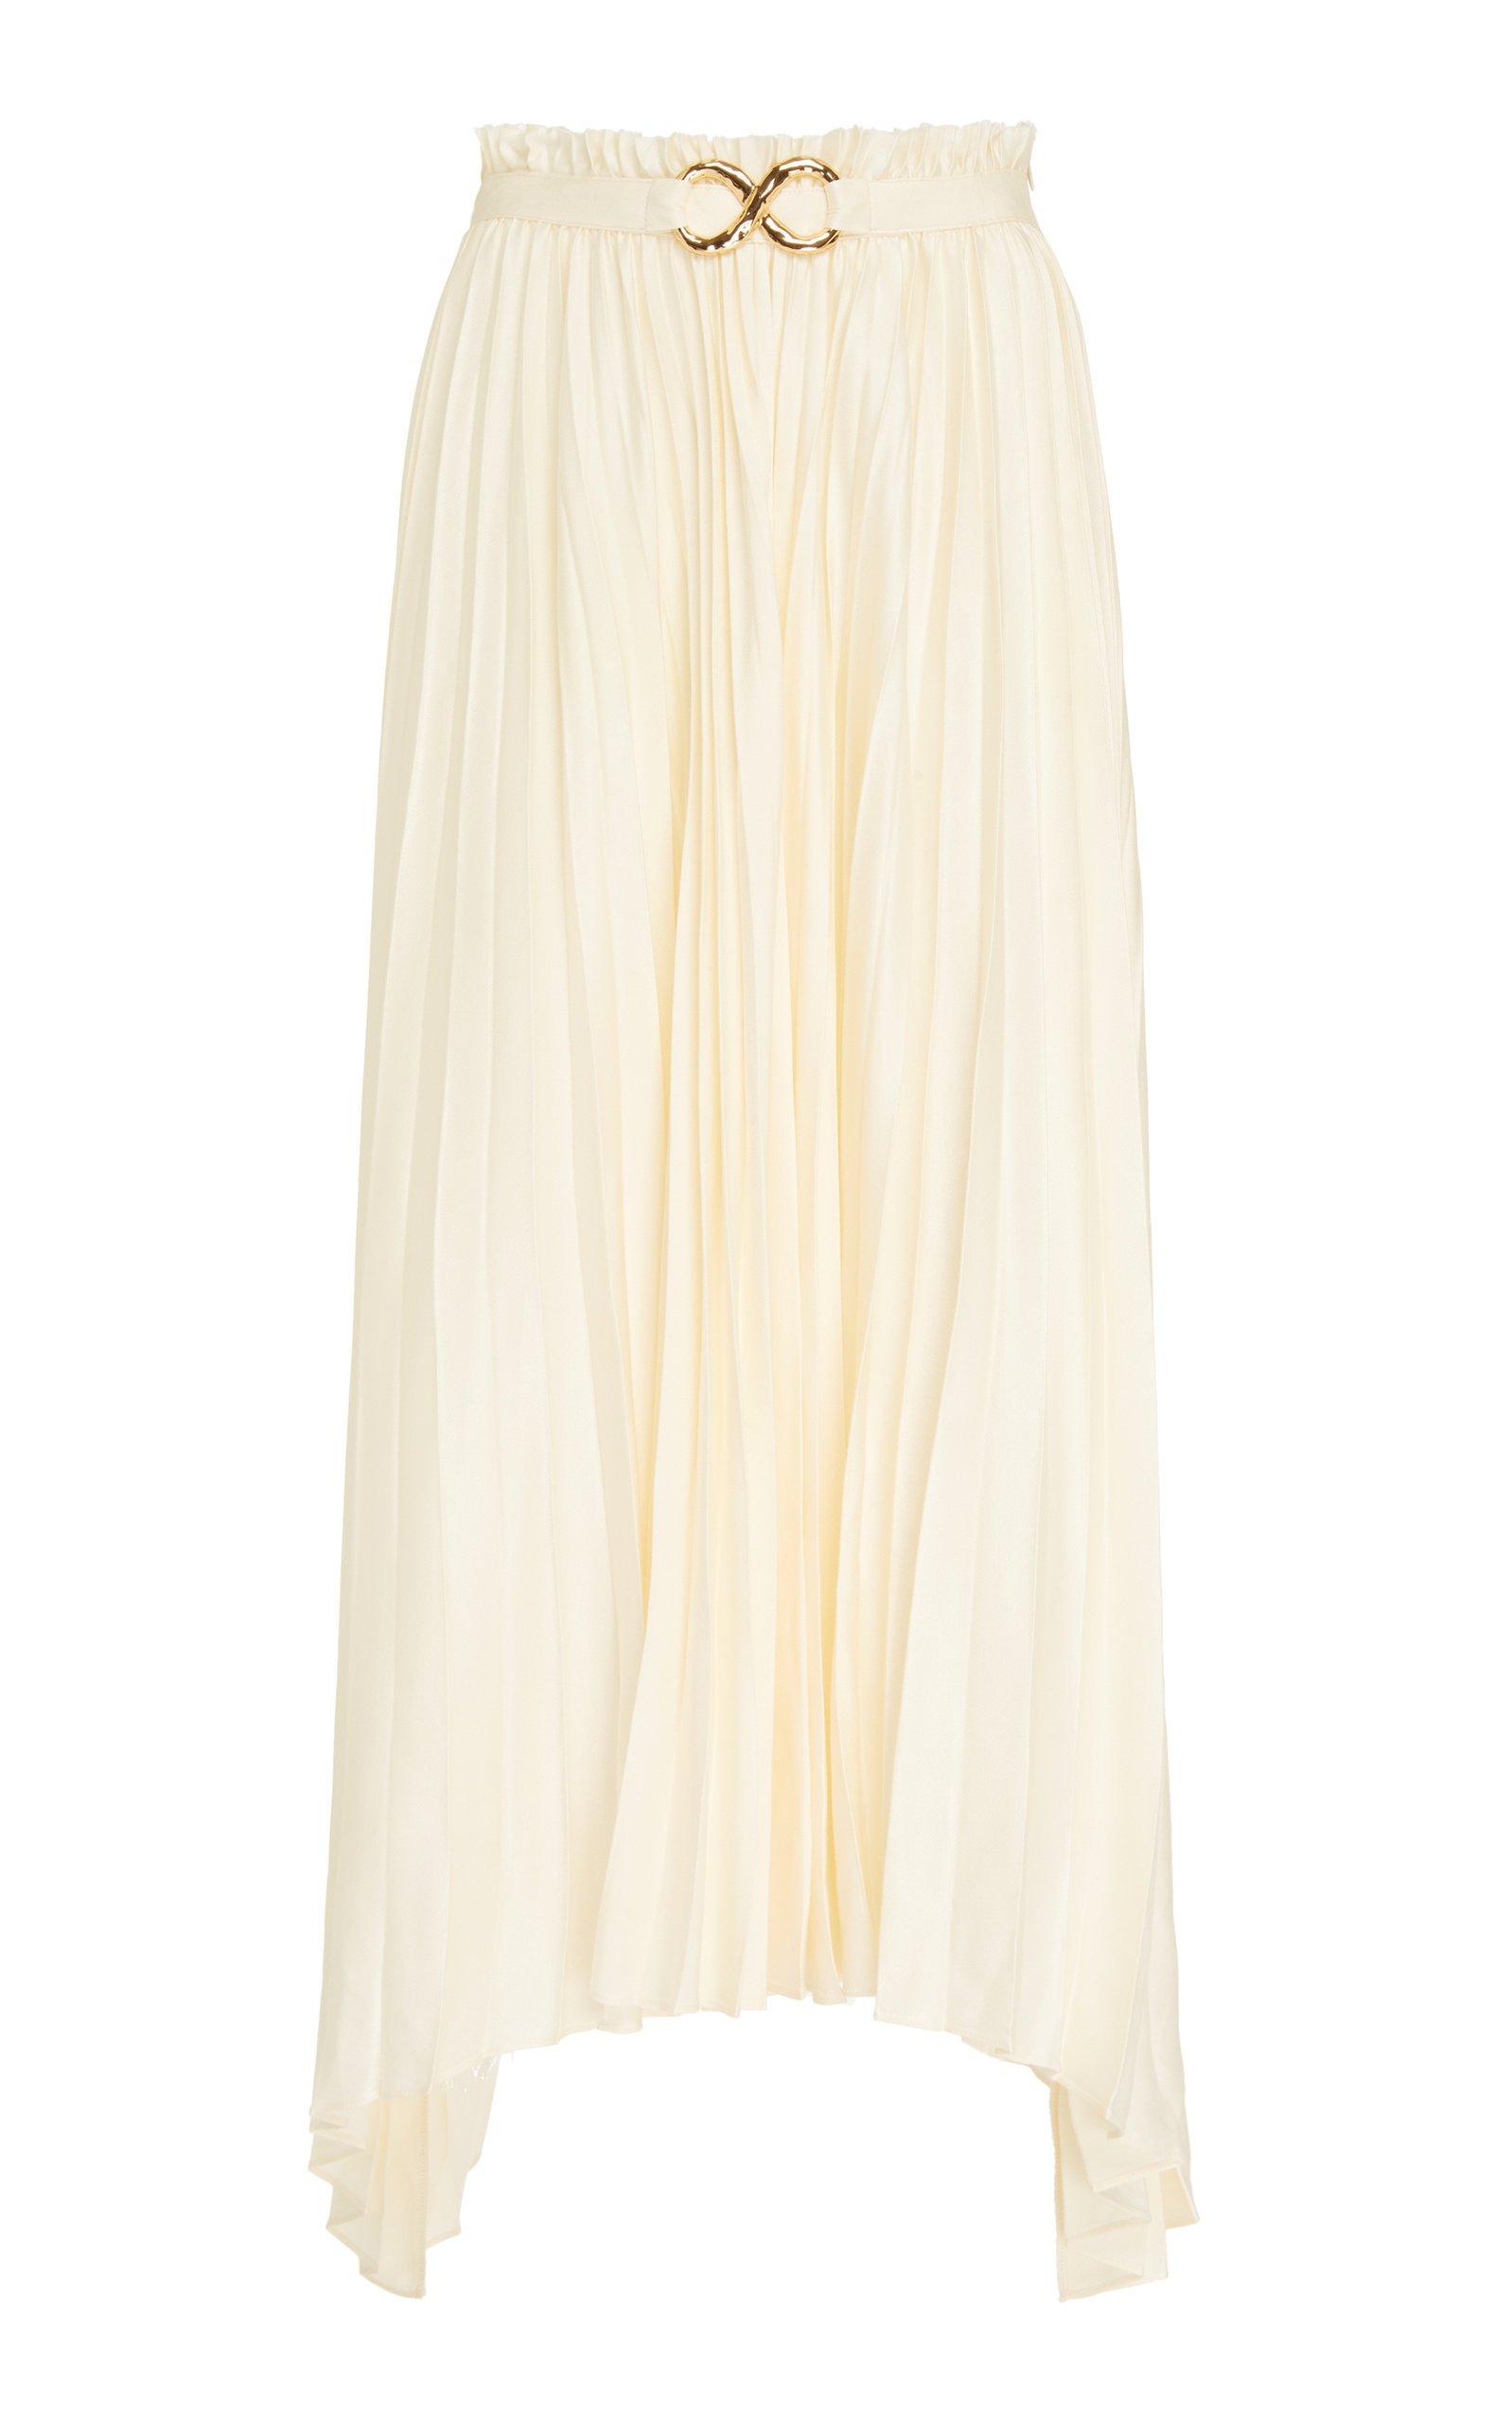 Rejina Pyo Kiera Pleated Satin Midi Skirt Size: 16